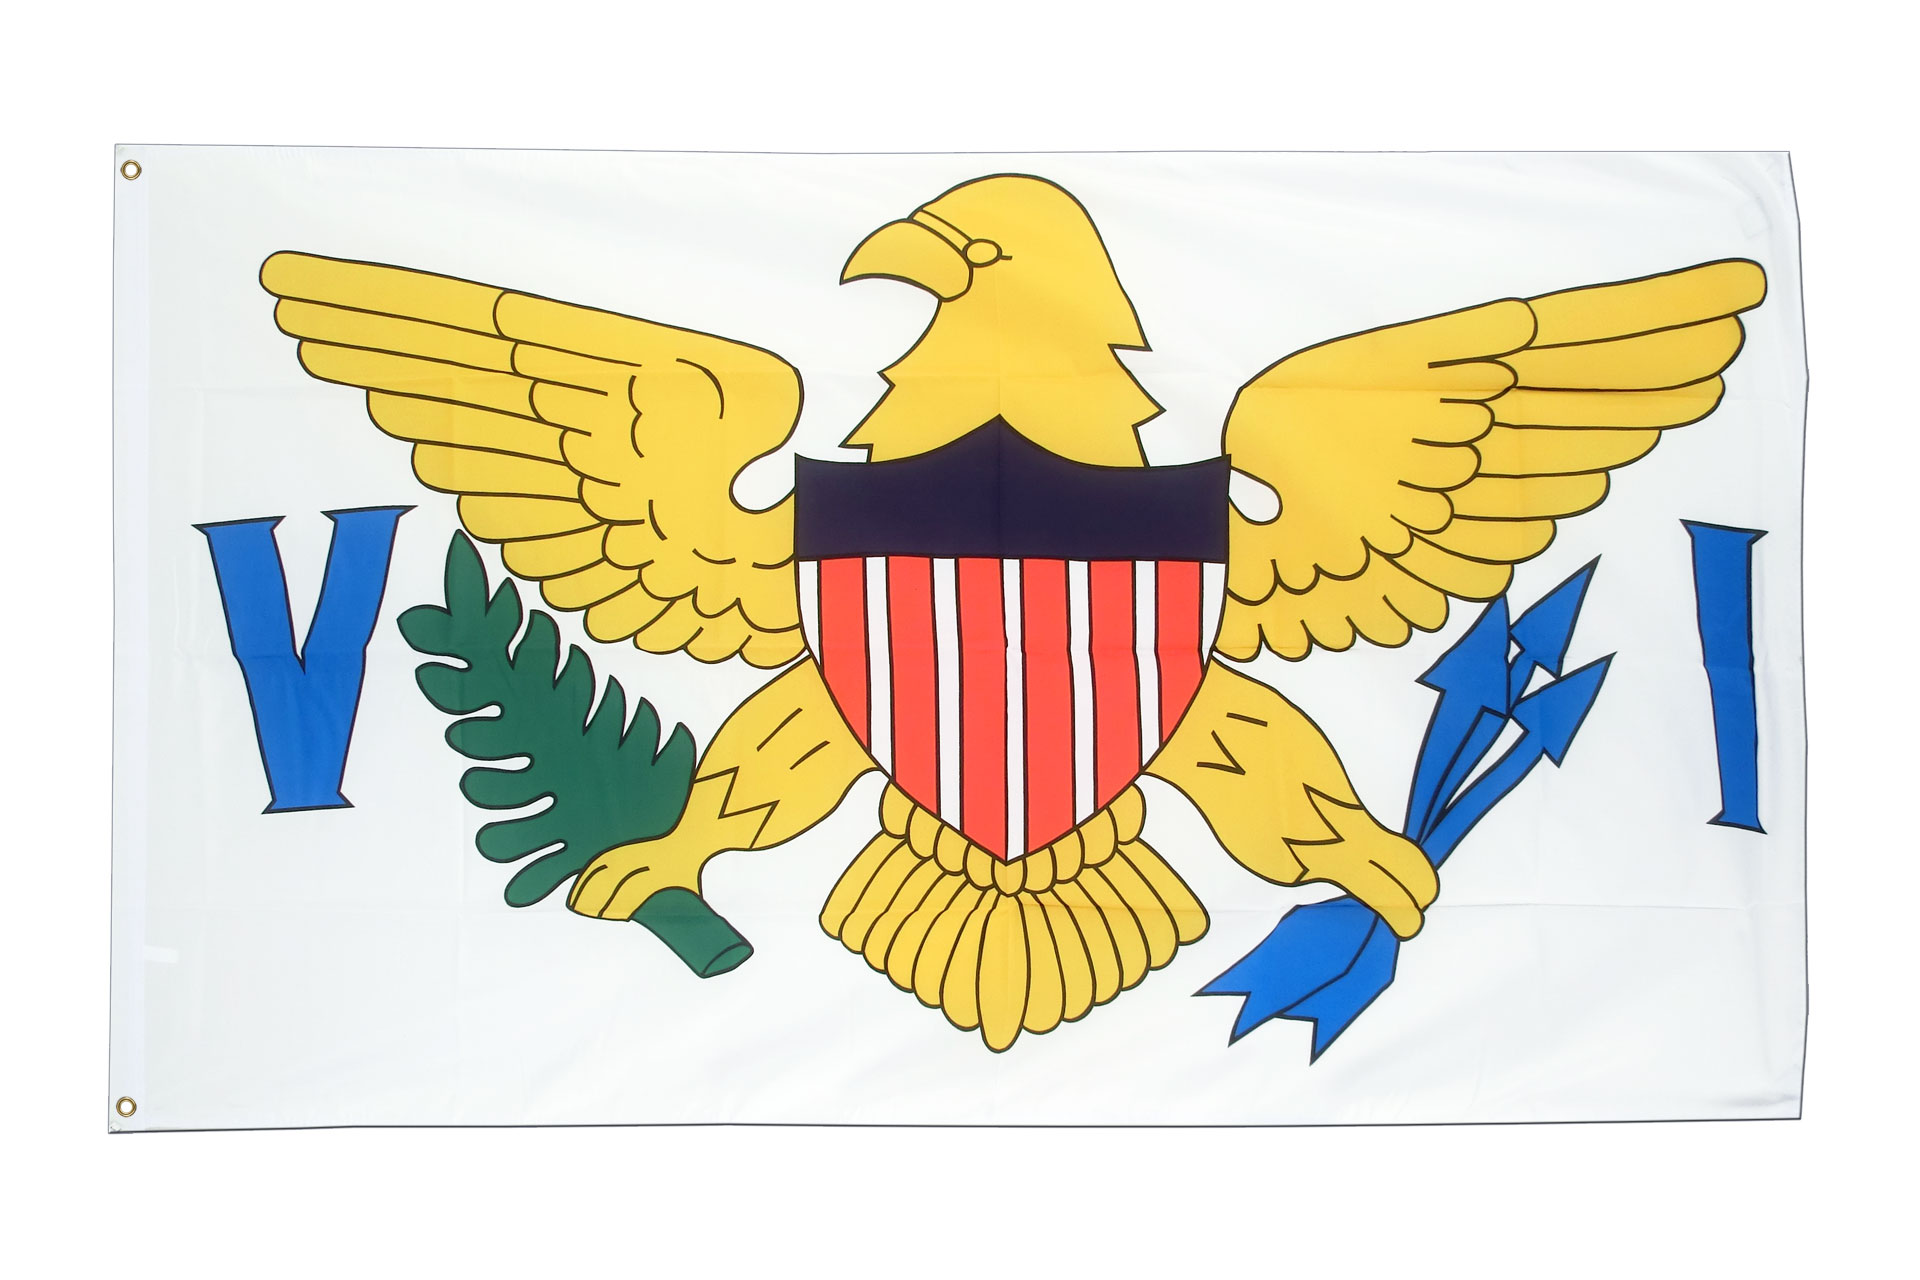 Buy Virgin Islands Flag - 3x5 ft (90x150 cm) - Royal-Flags: https://www.royal-flags.co.uk/virgin-islands-flag-2100.html